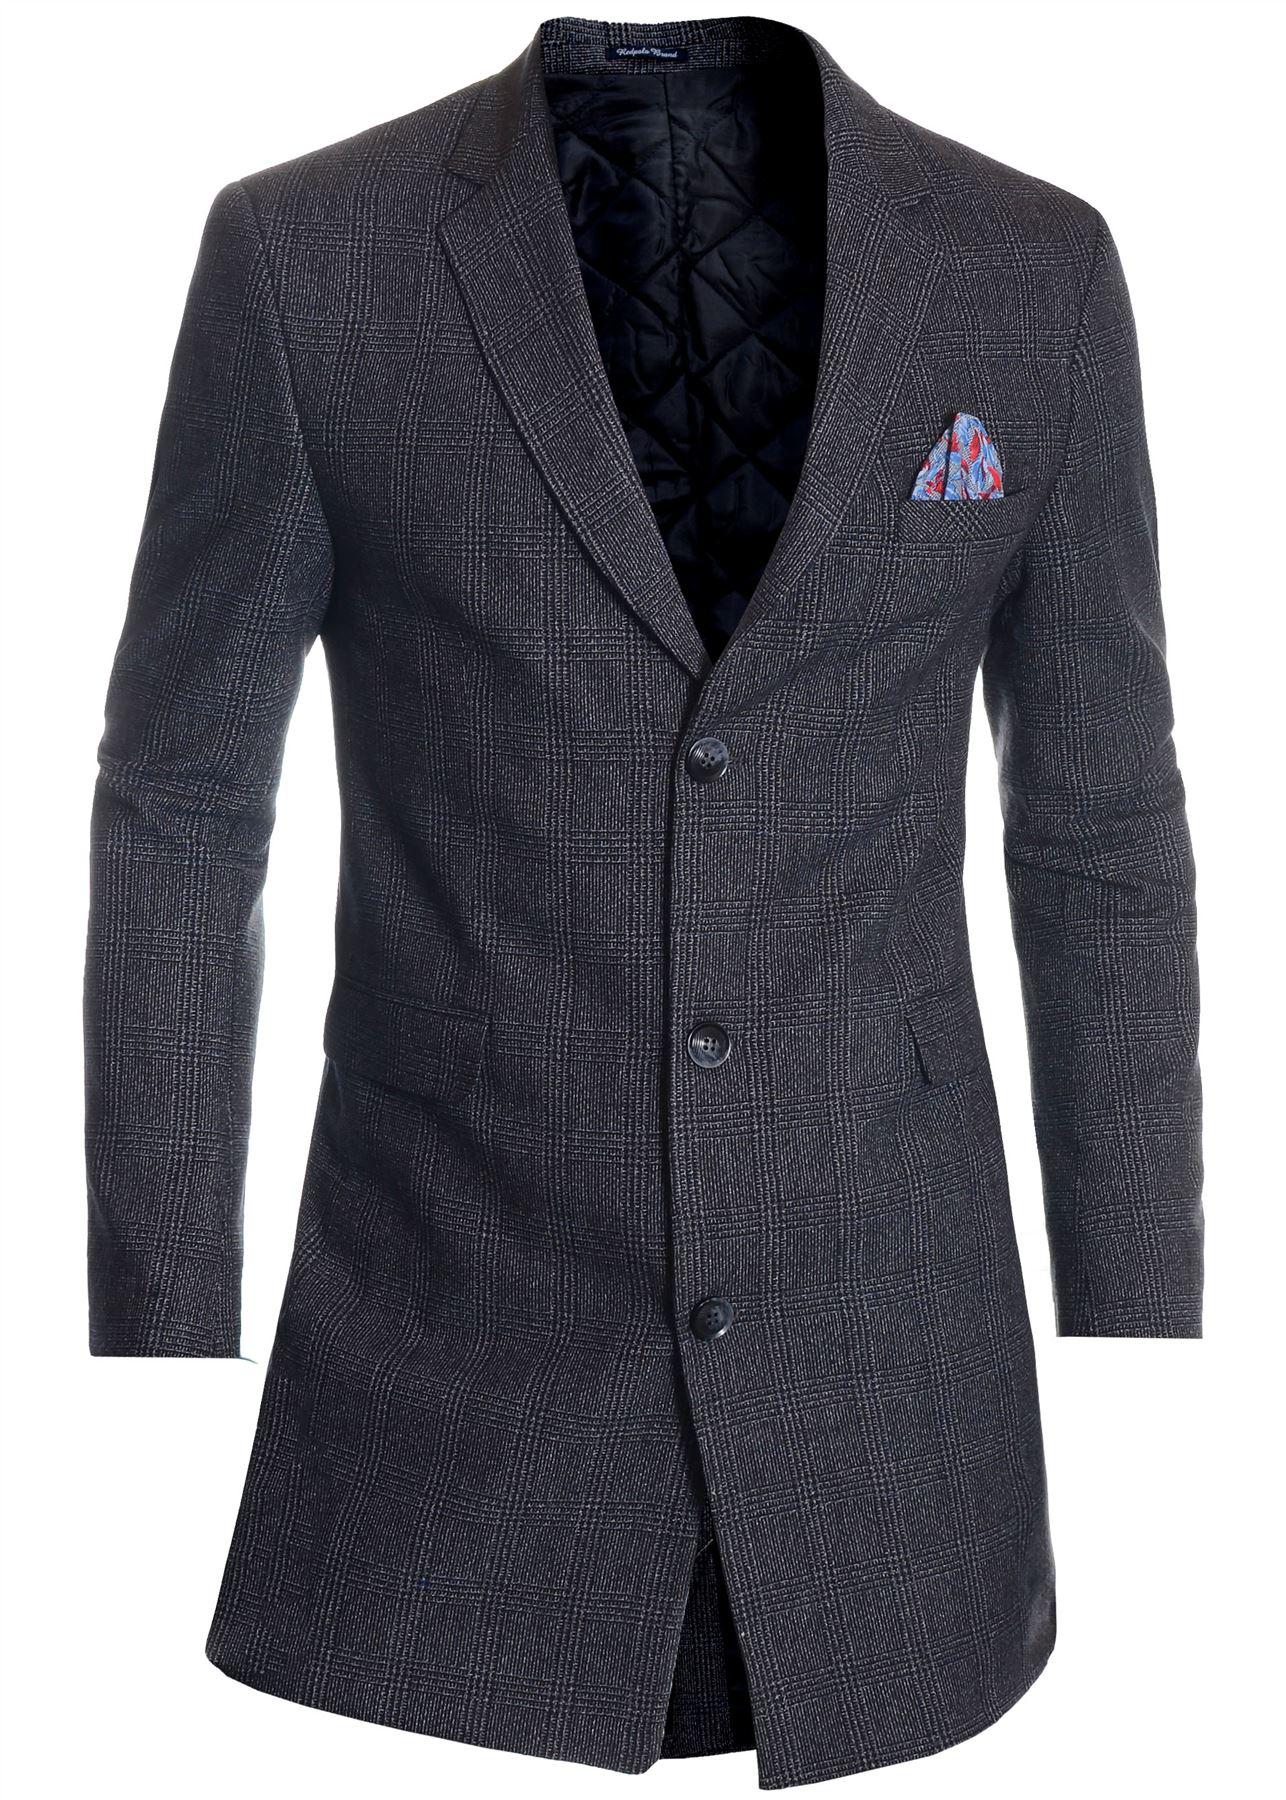 Men-039-s-Checkered-Coat-3-4-Long-Tweed-Cashmere-Wool-Trendy-Formal-Winter-Overcoat thumbnail 24